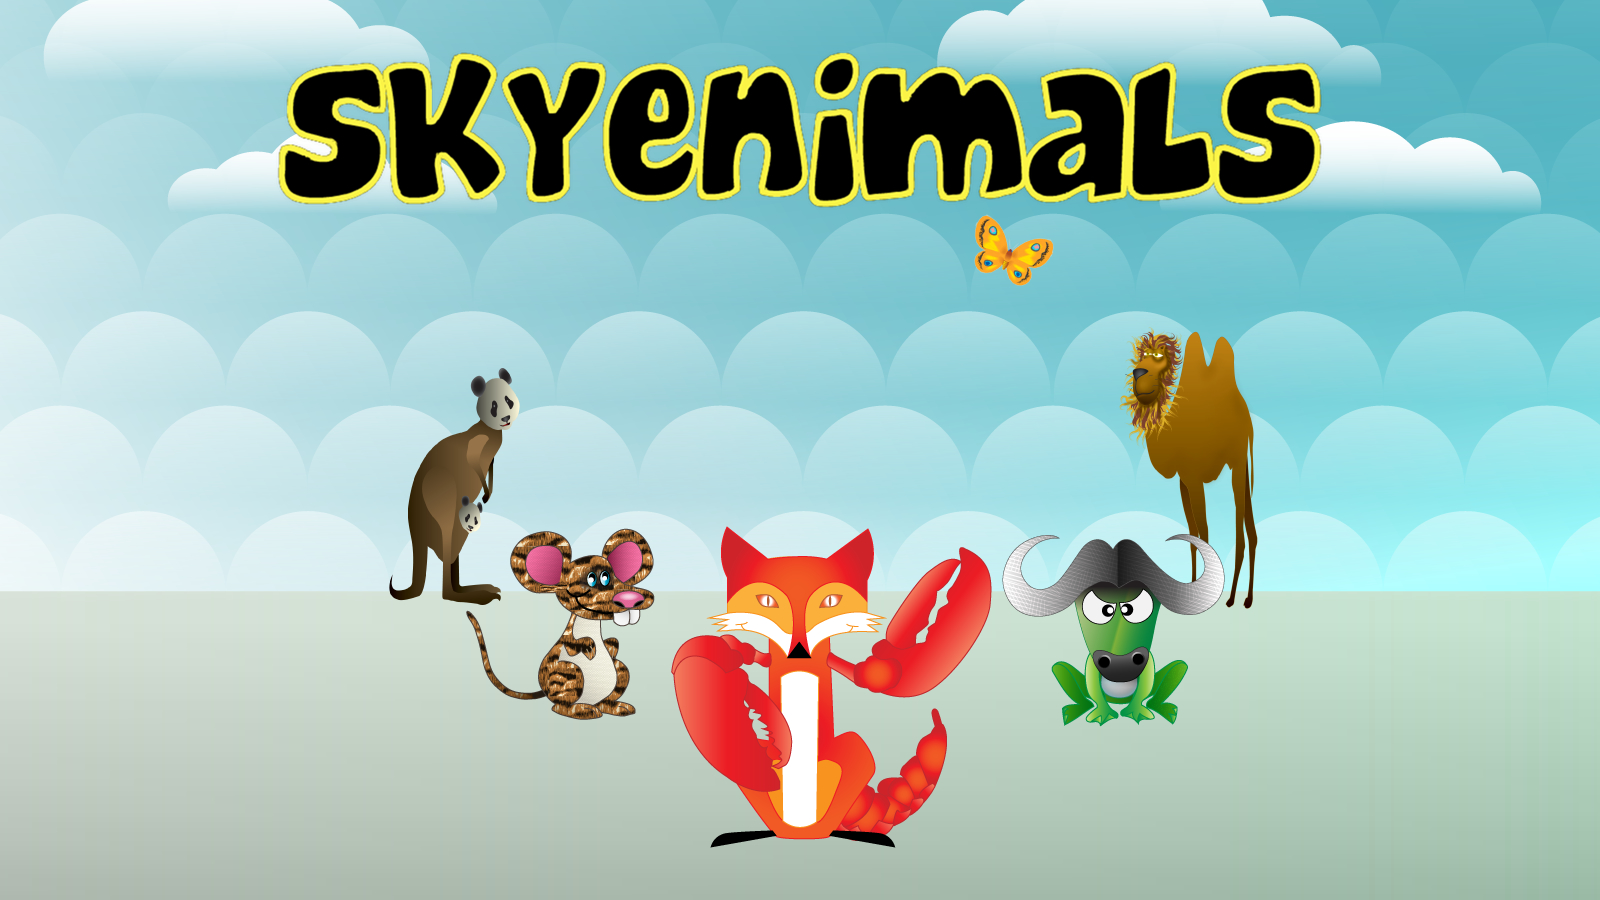 free skyenimal wallpaper images